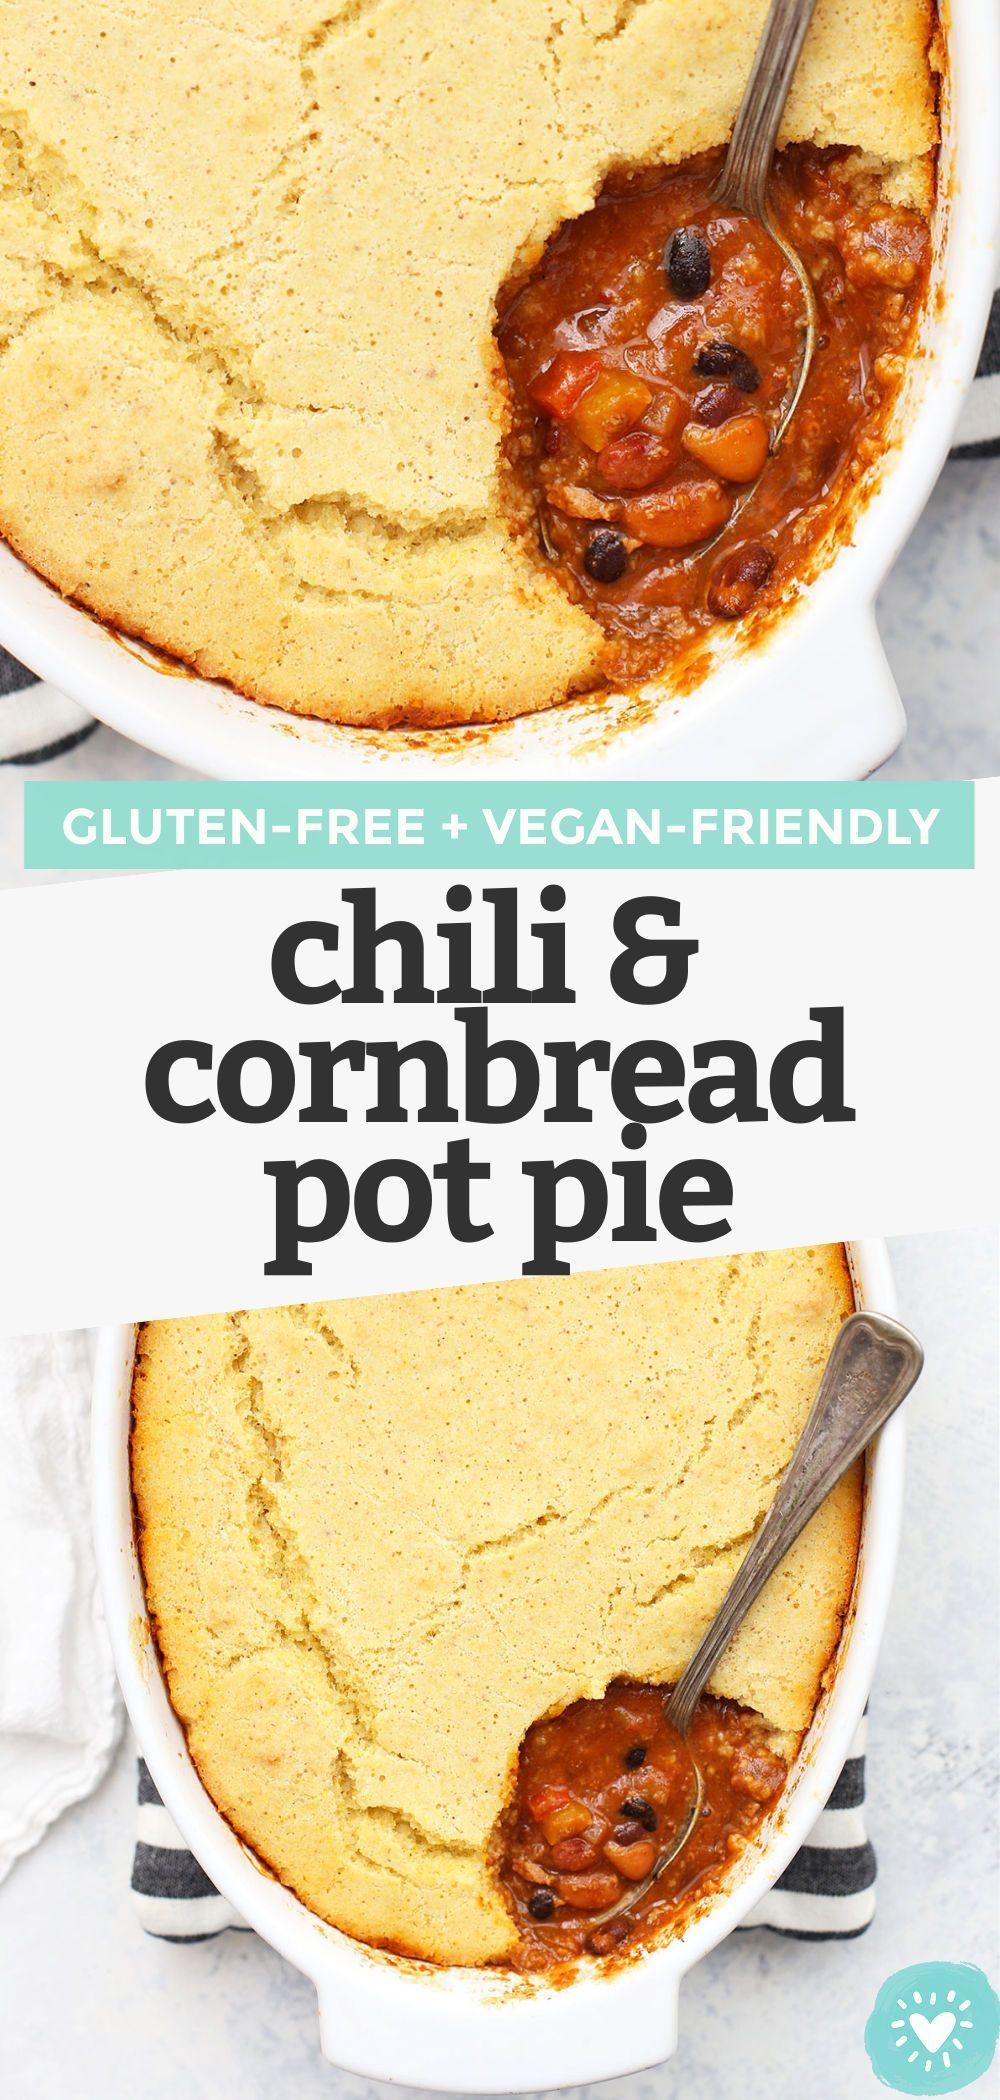 Chili Cornbread Pot Pie Gluten Free Vegan Friendly Recipe In 2020 Pot Pie Pot Pies Recipes Chili And Cornbread